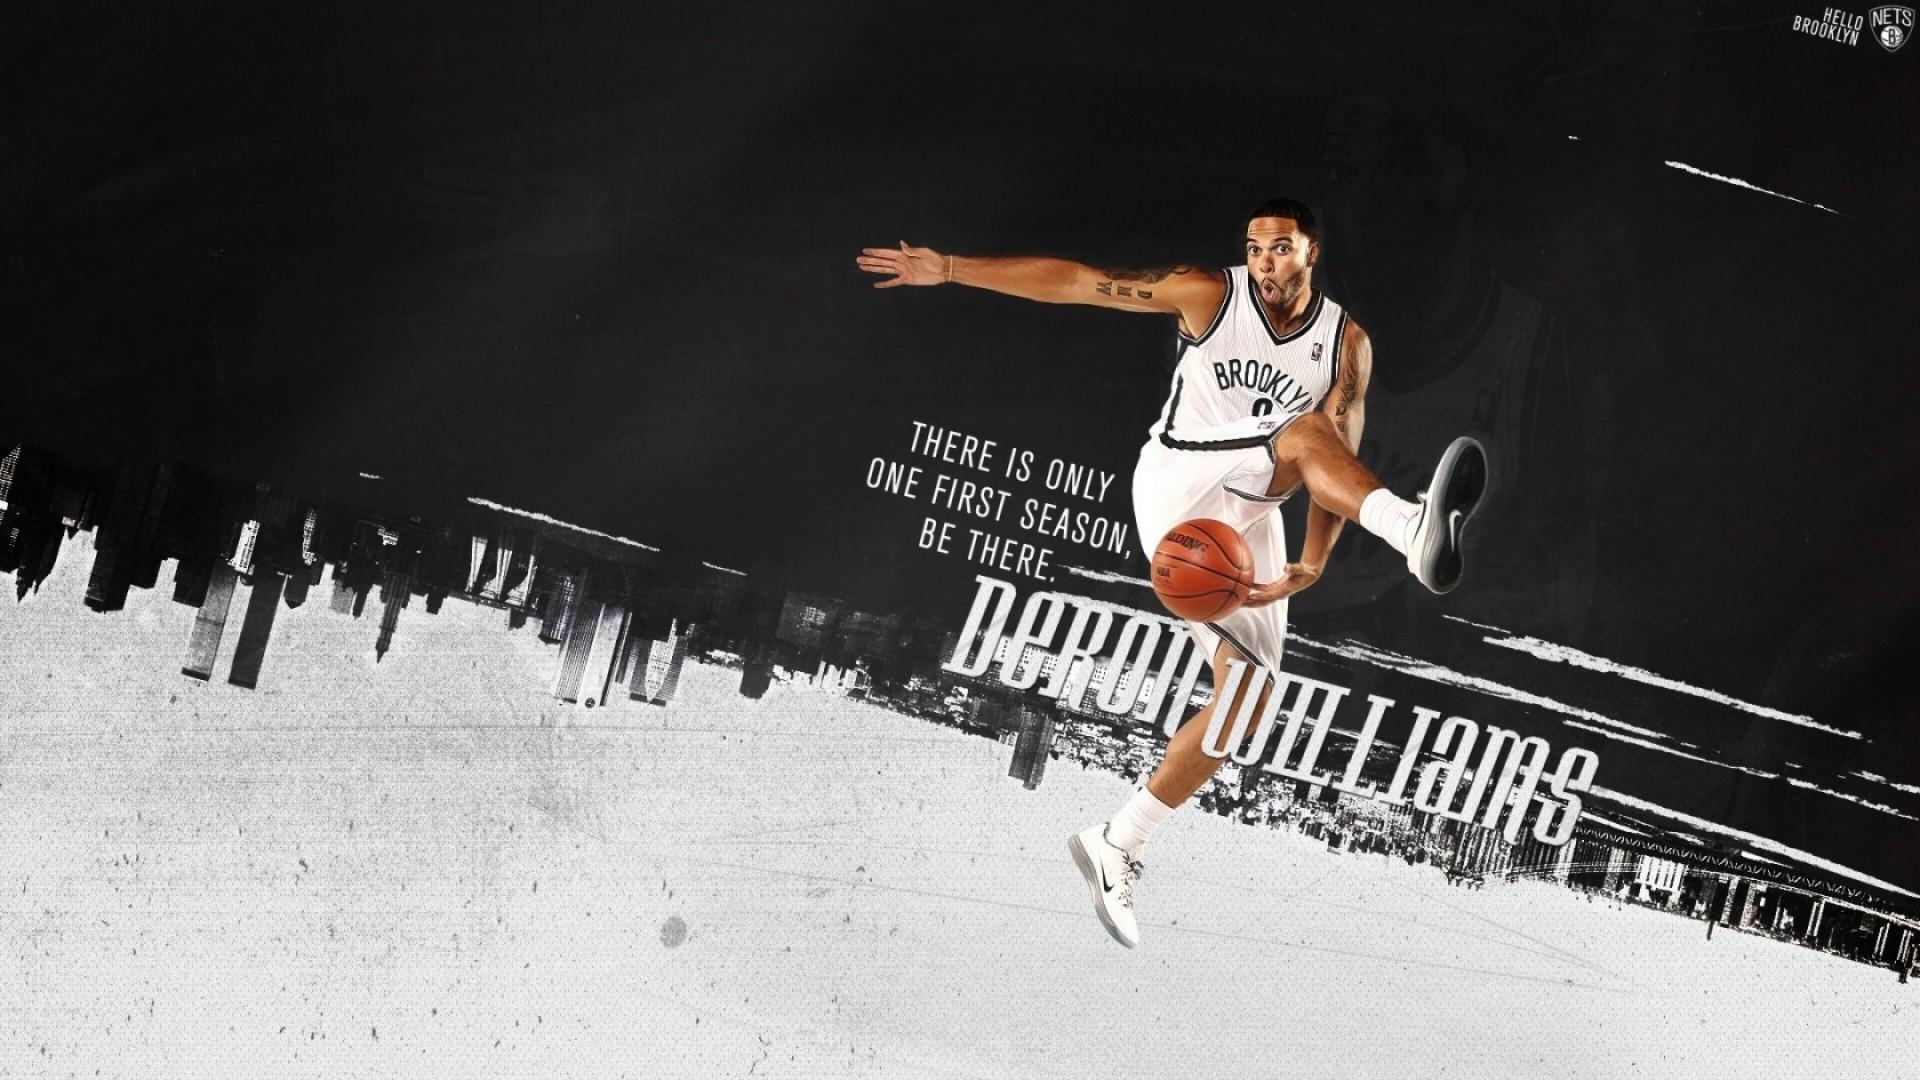 2560x1440 BROOKLYN NETS Nba Basketball 15 Wallpaper